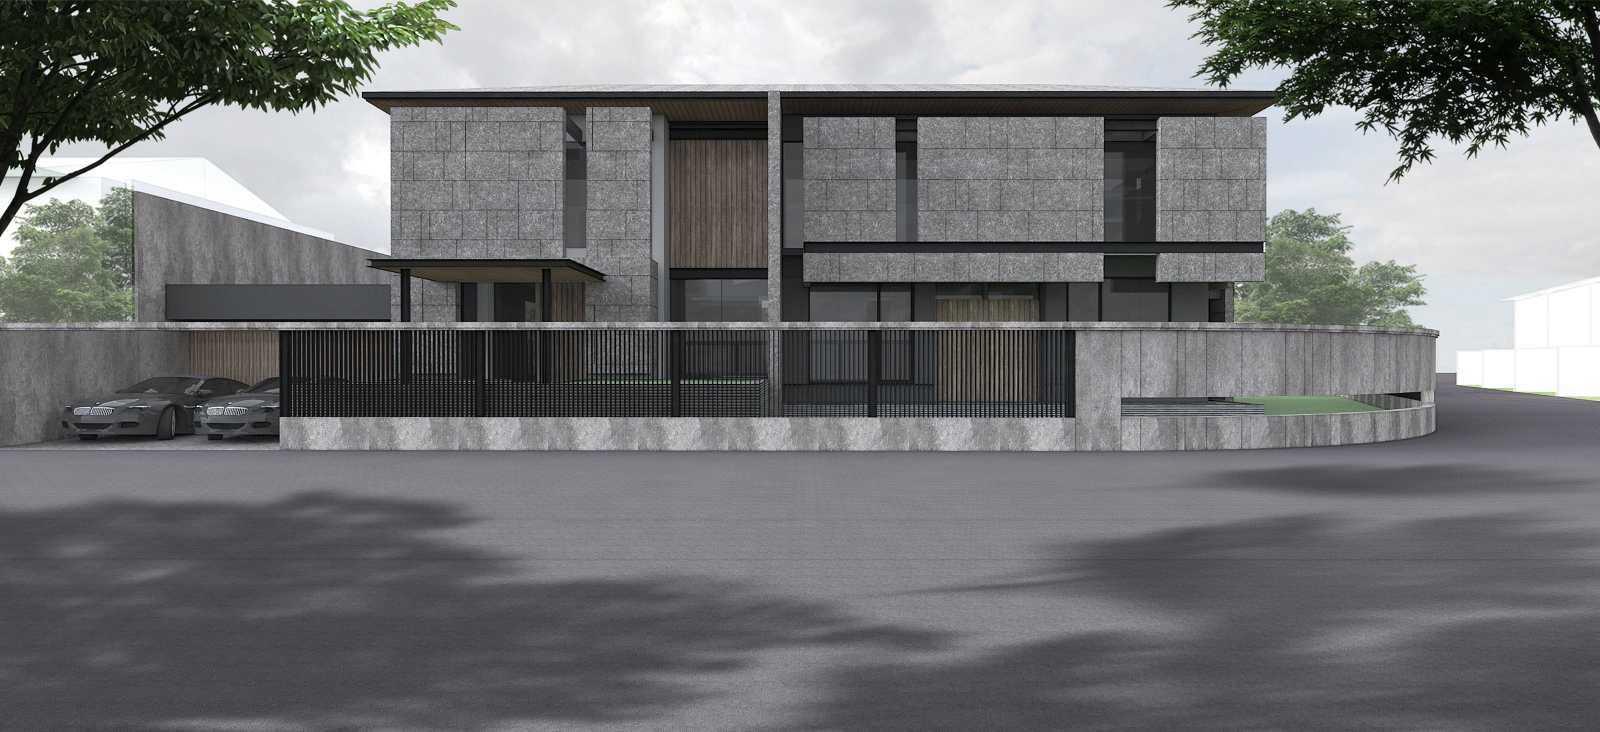 Q Studio An House Depok, Kota Depok, Jawa Barat, Indonesia Depok, Kota Depok, Jawa Barat, Indonesia Q-Studio-An-House   68762